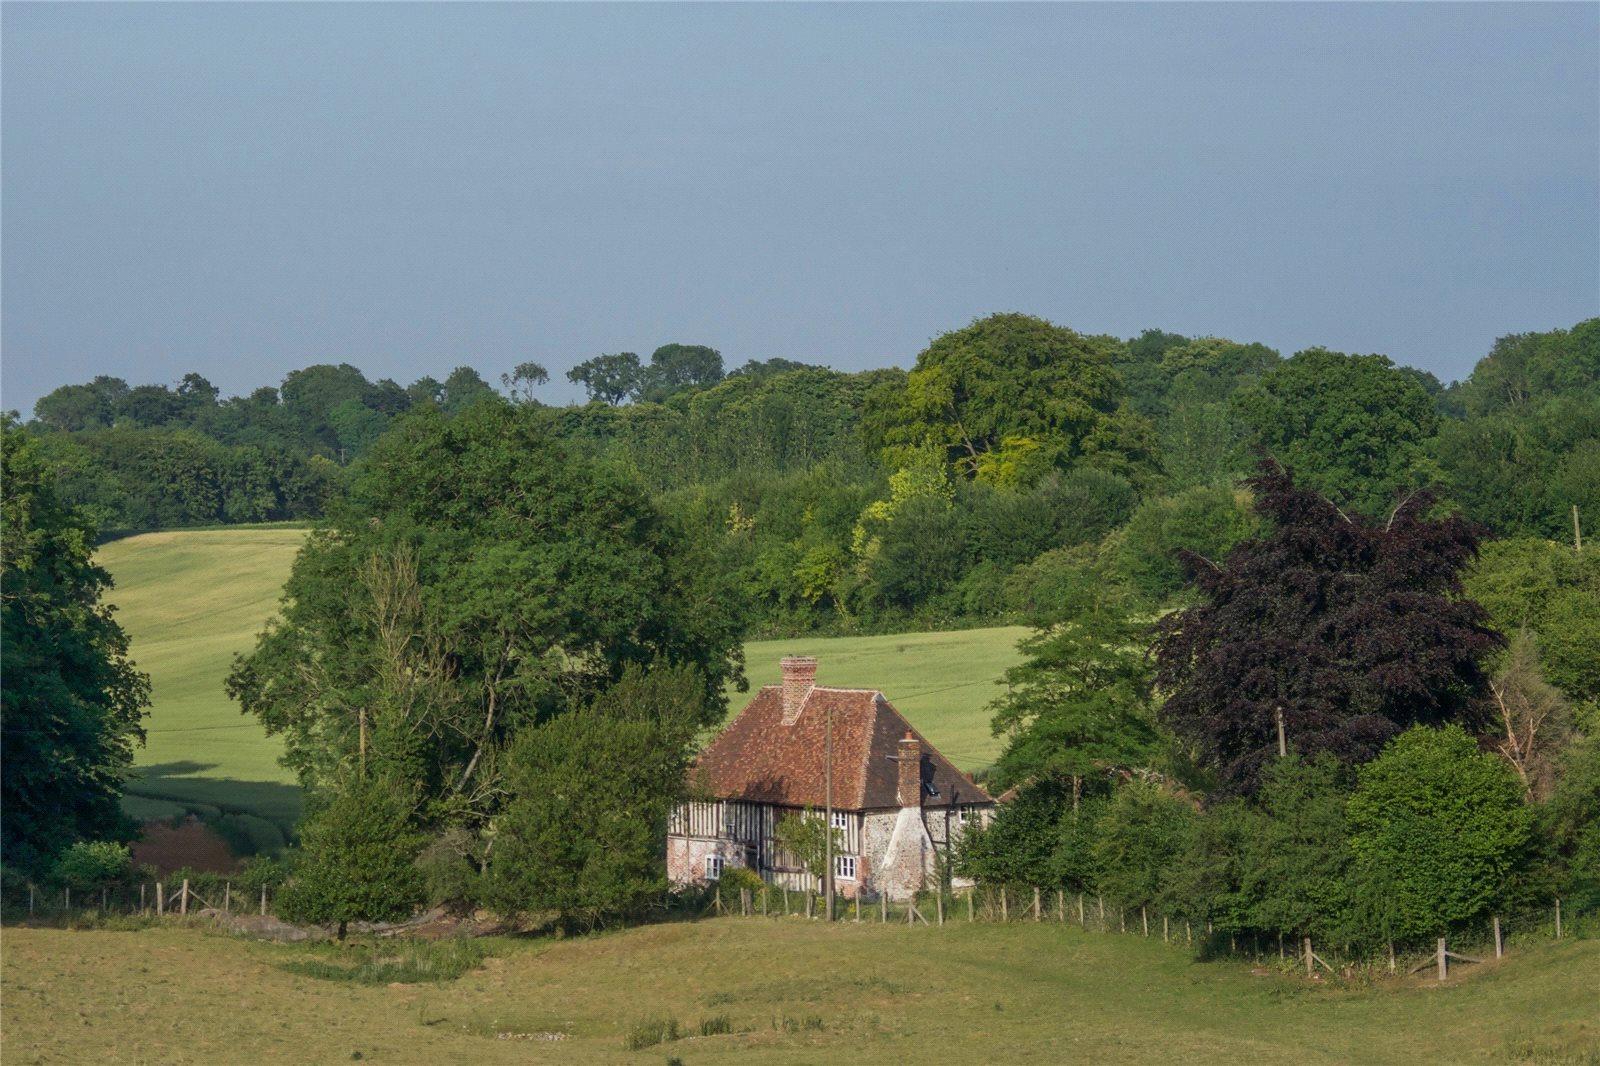 Moradia para Venda às Hillside Road, Stalisfield, Faversham, Kent, ME13 Faversham, Inglaterra